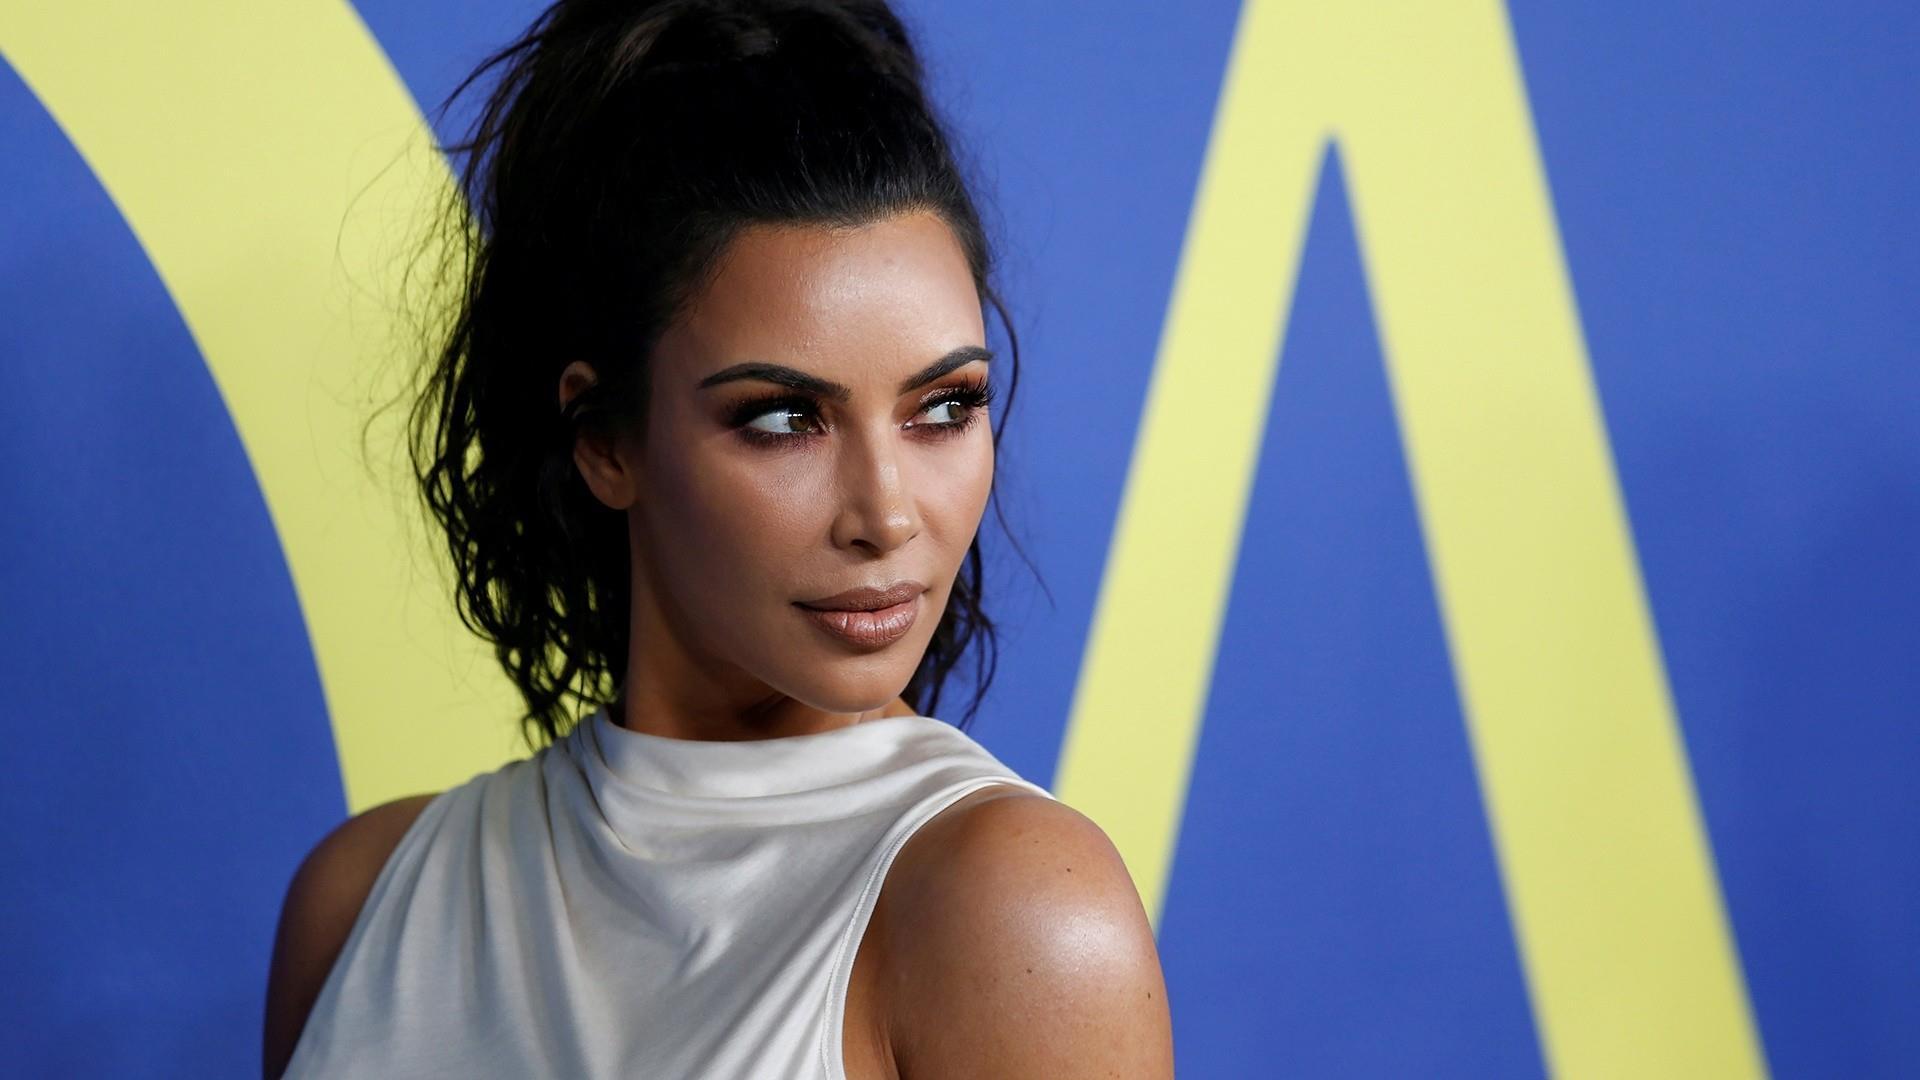 Kim Kardashian West reveals family's annual Christmas card